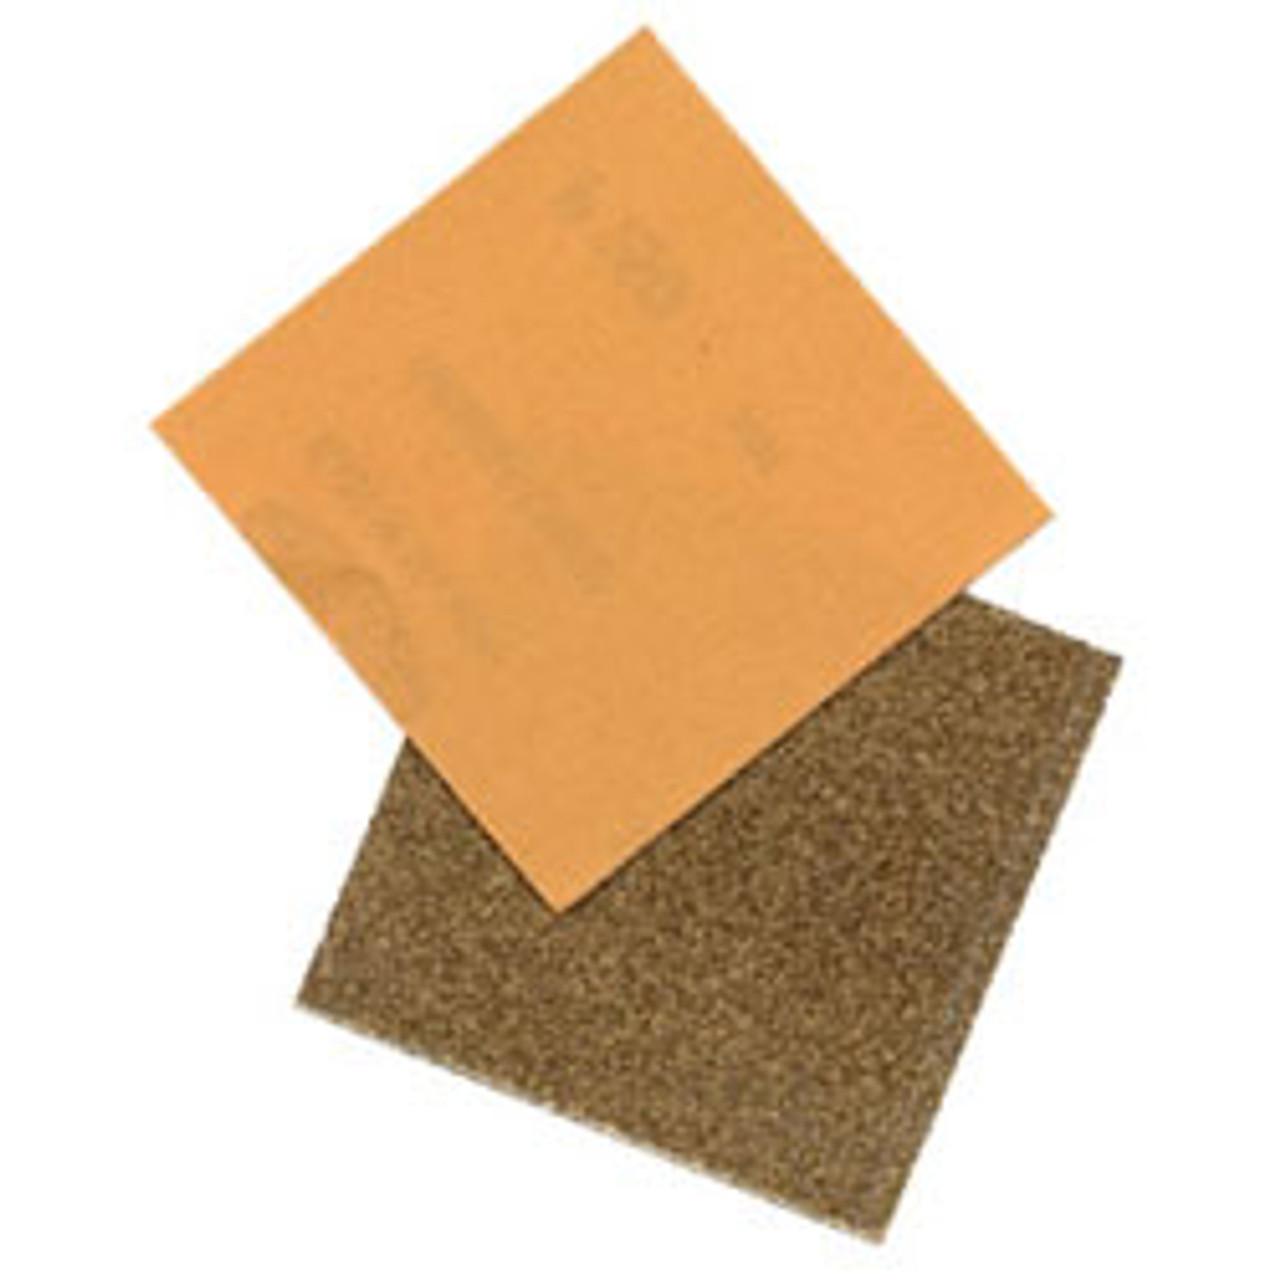 "Klingspor Abrasives 4.5""x 4.5"" Pressure Sensitive Adhesive, Paperbacked Roll, 60 Grit, Aluminum Oxide, 5pk"